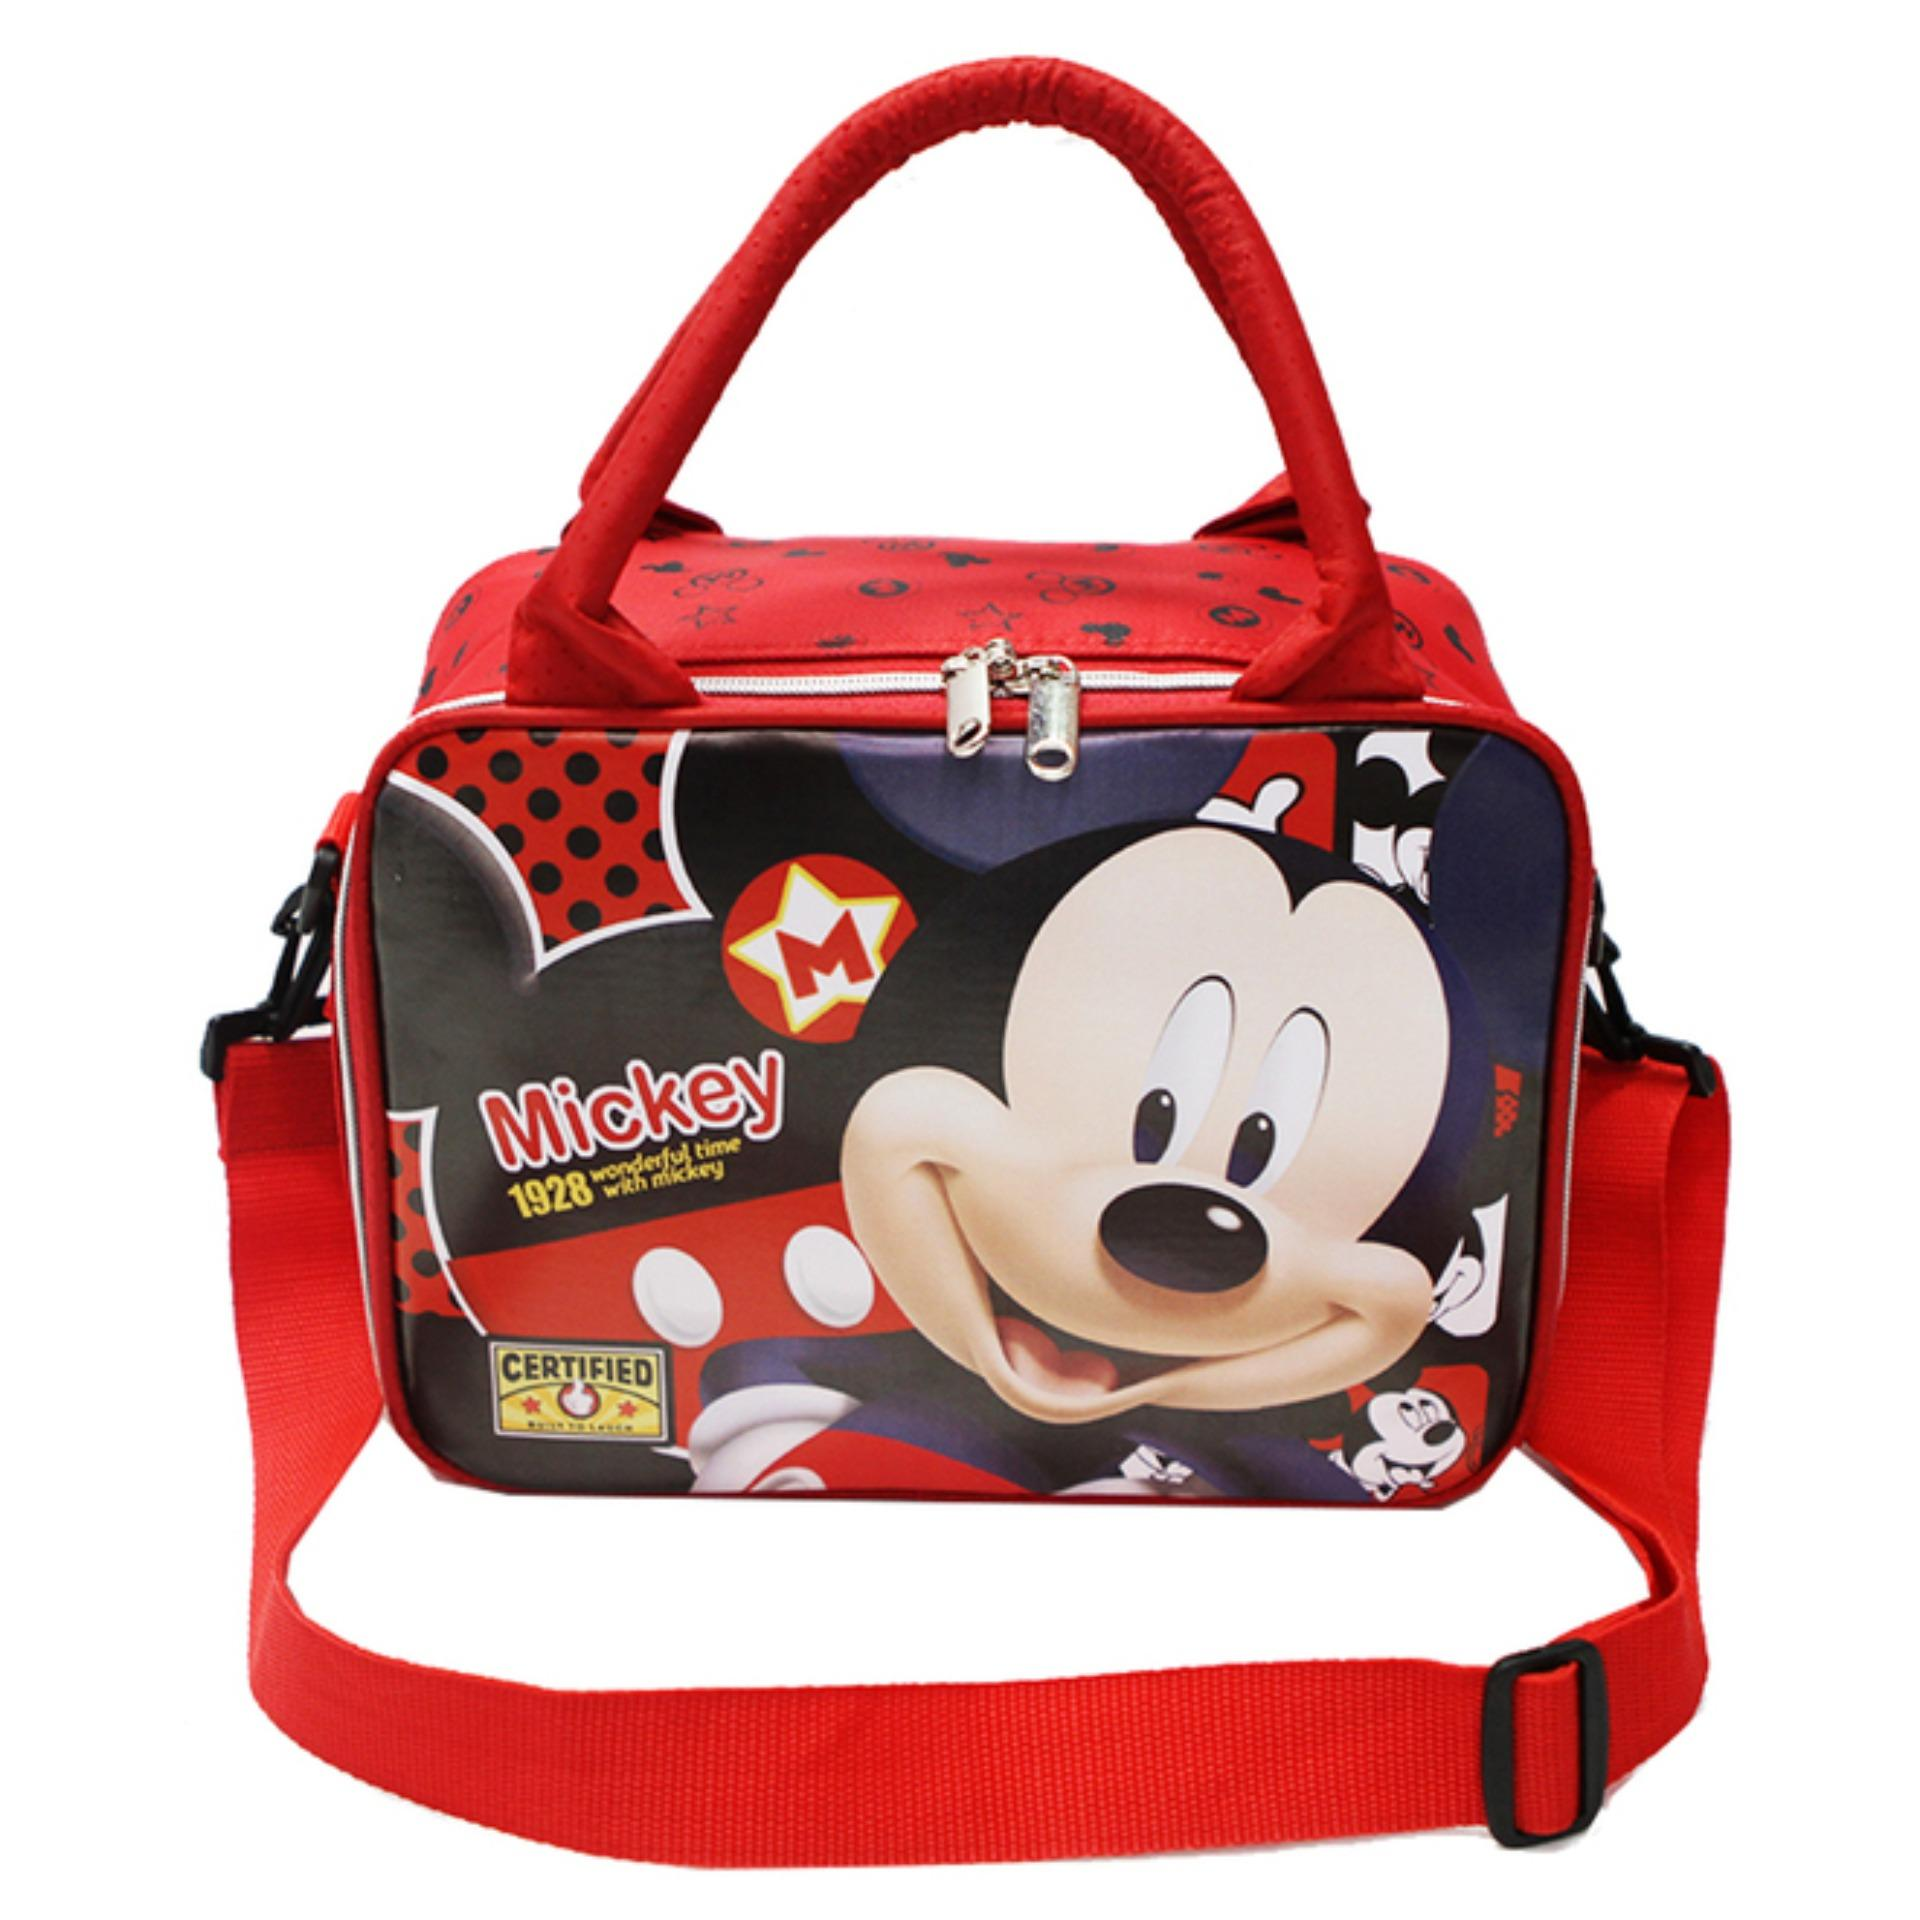 7dfcbf90c8c3 Onlan Tas Travel Bag Mini Karakter Anak Tali Selempang Bahan Kain Sponge  Tahan Air